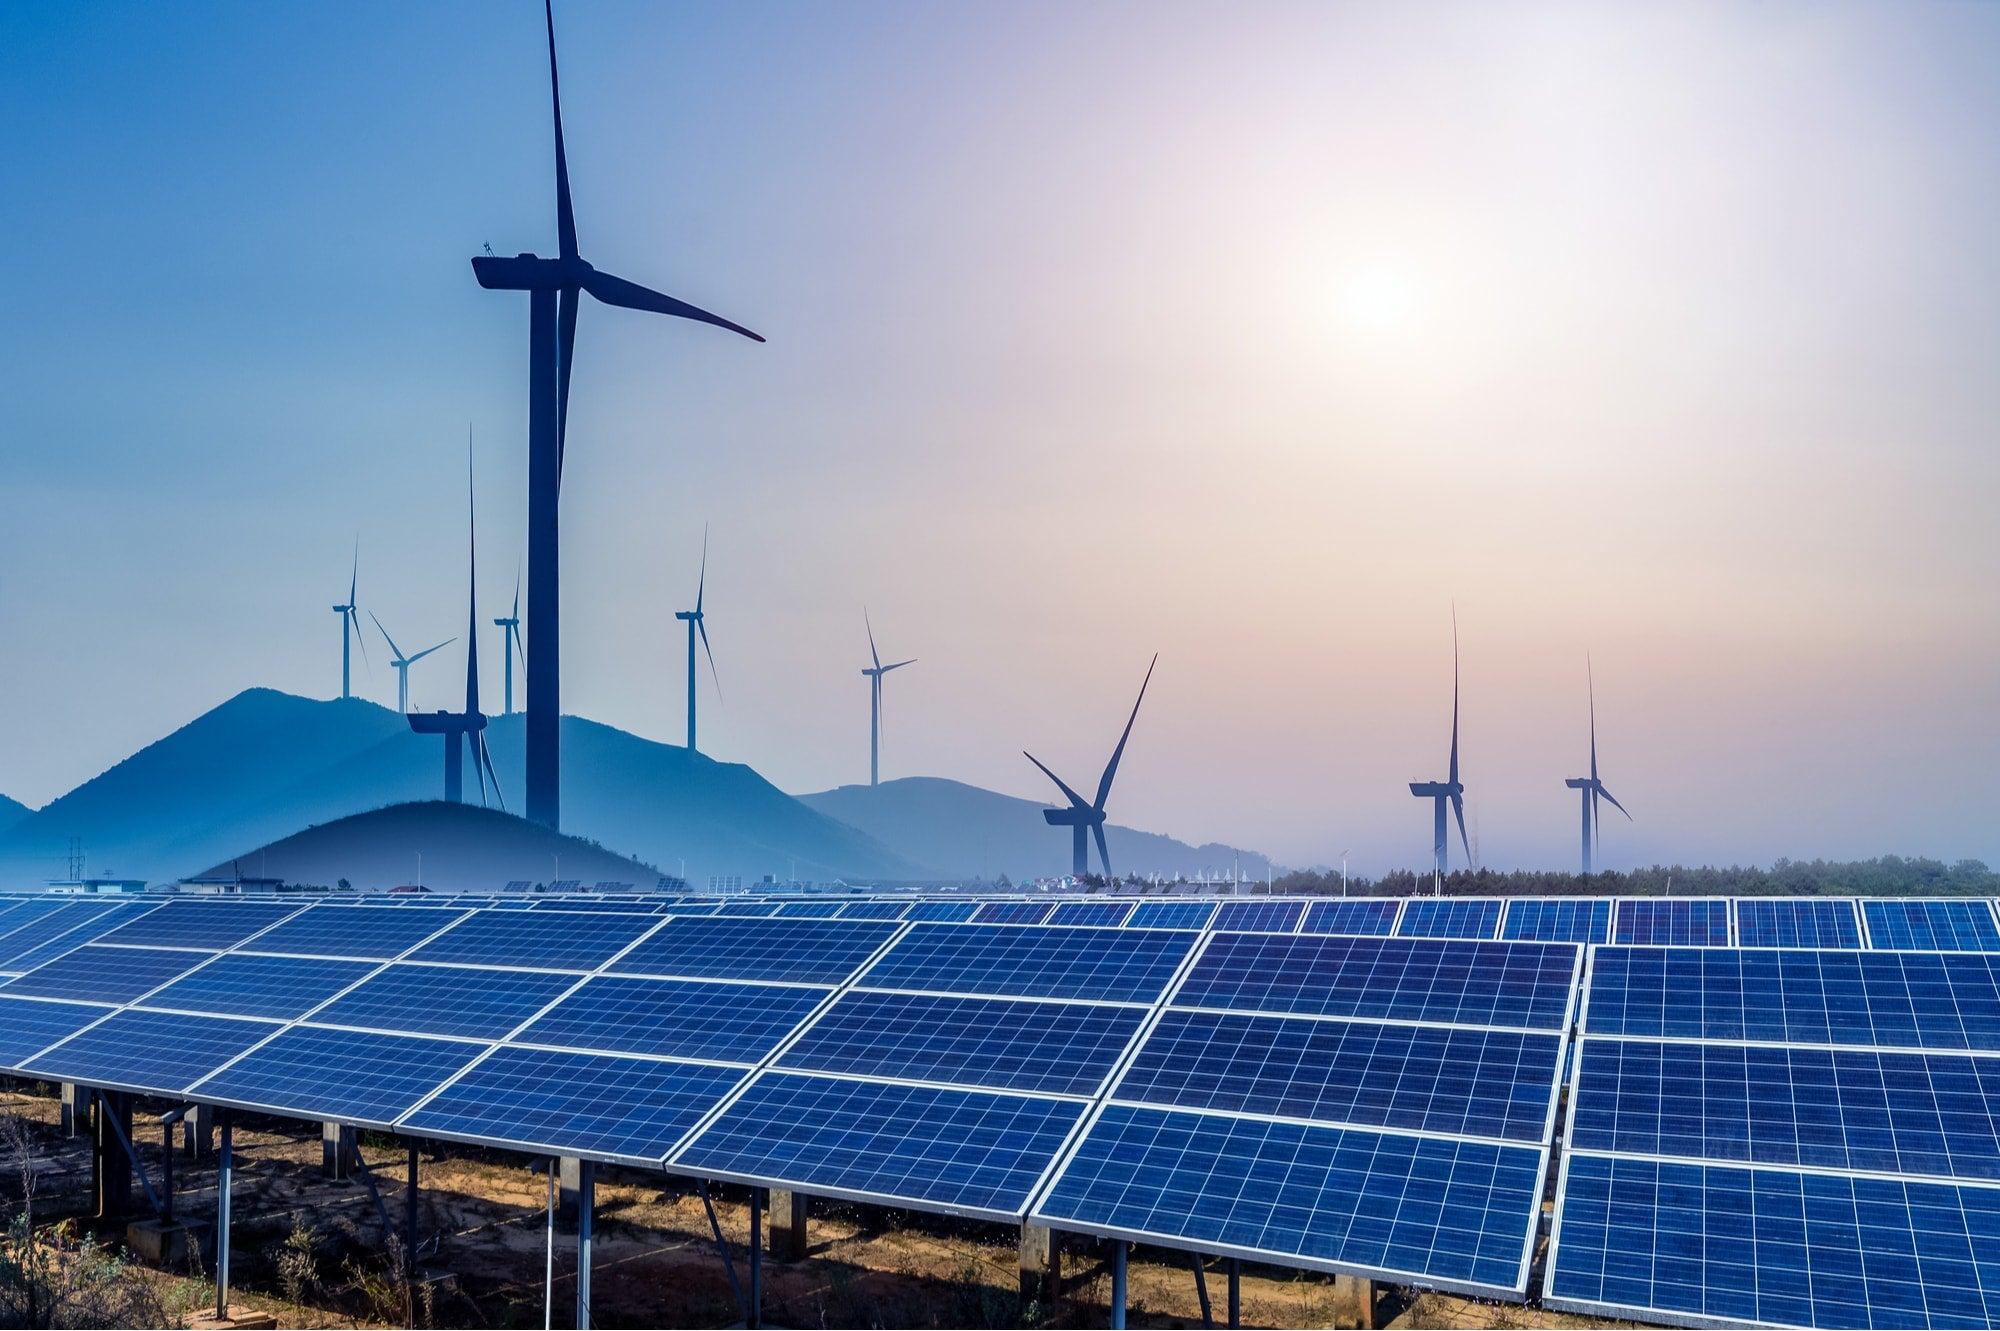 energia renovable infraestructura costos America Latina Caribe